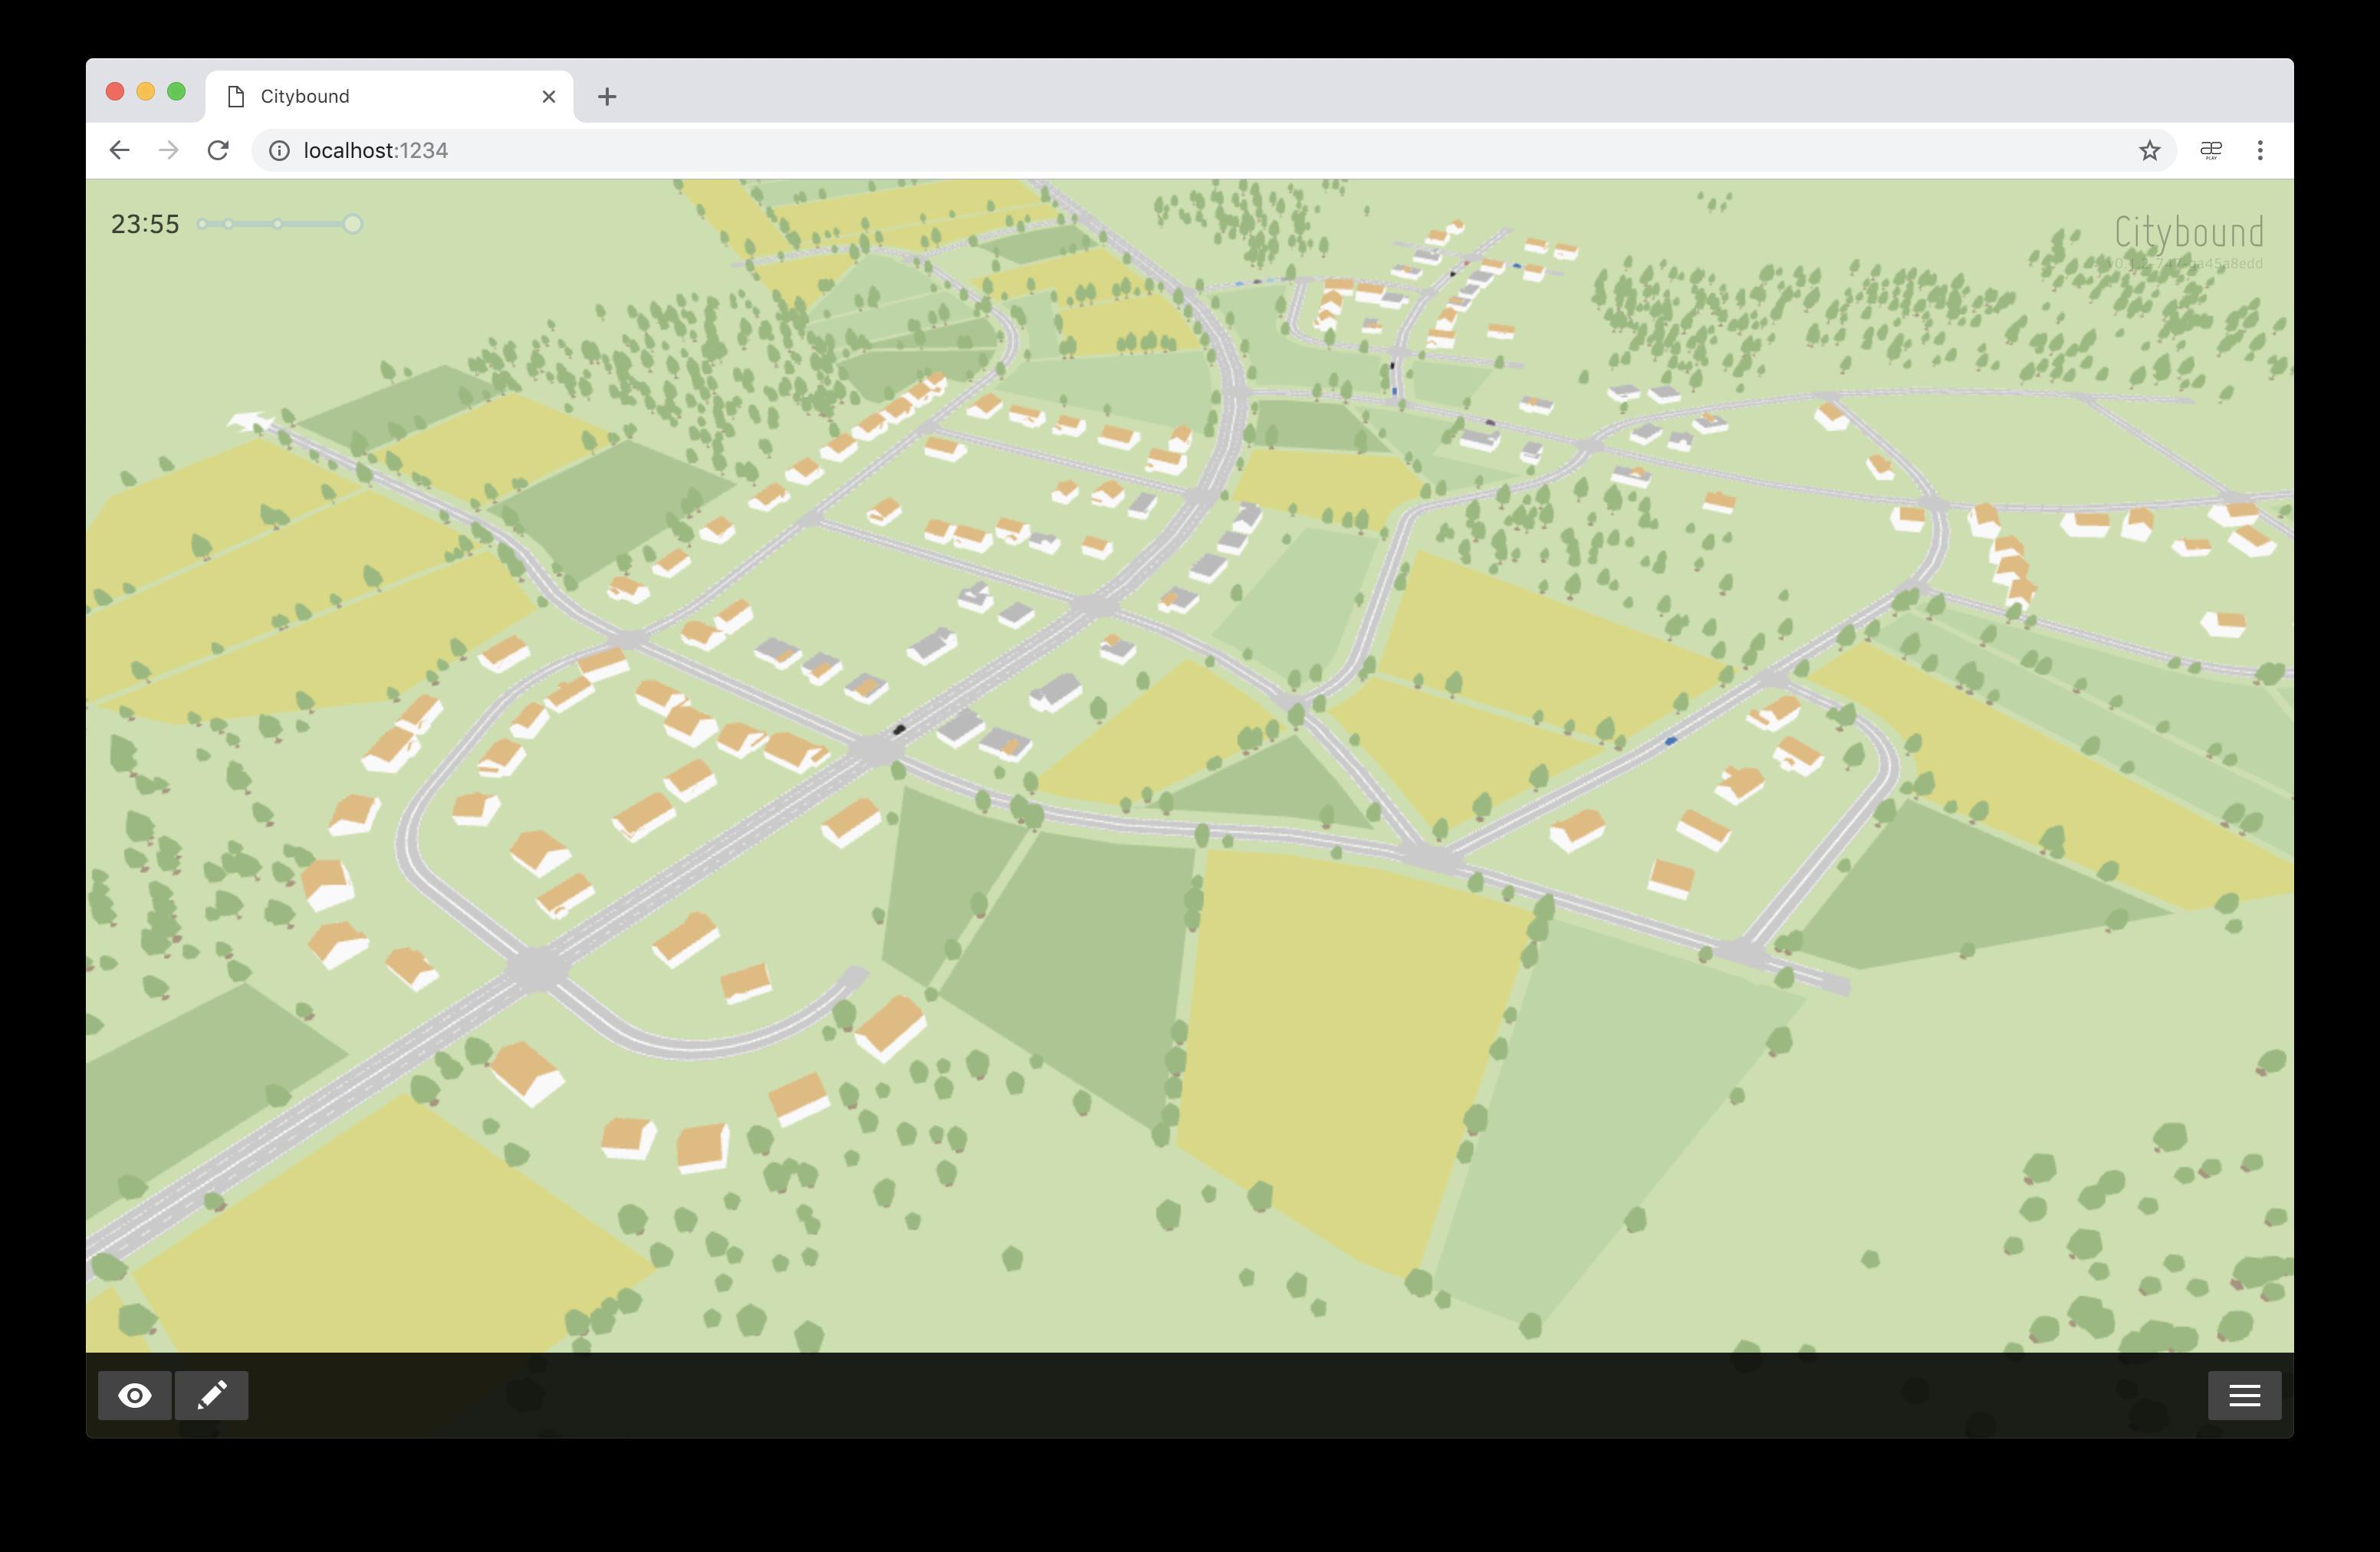 citybound web ui screenshot